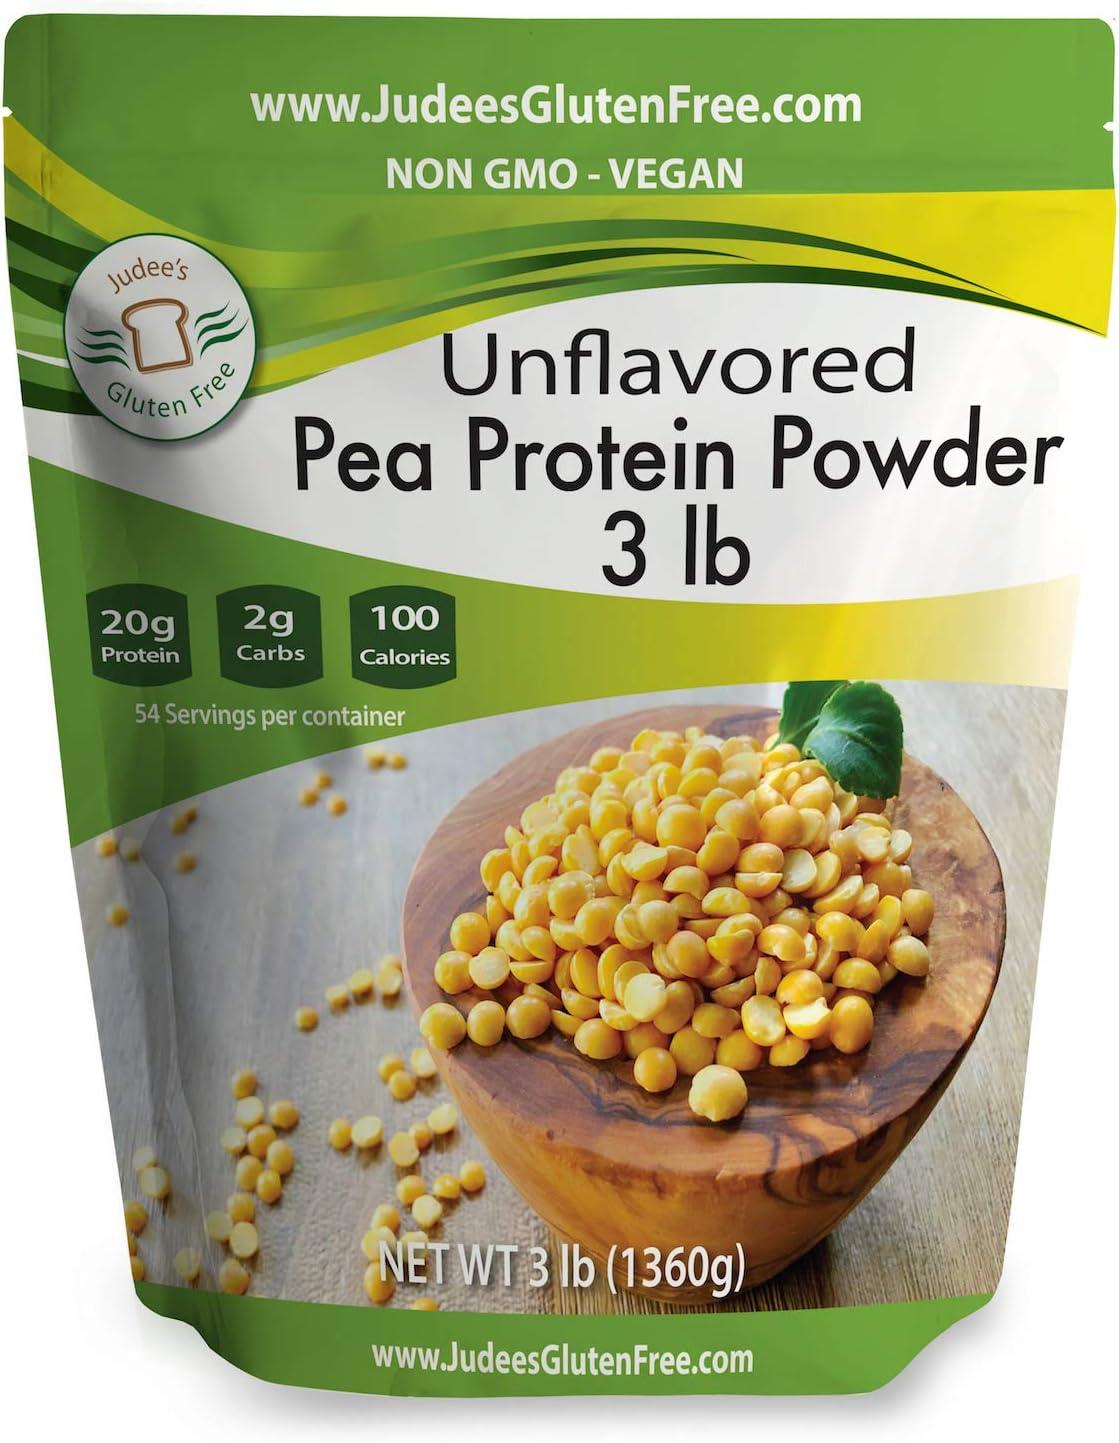 Pea Protein Powder (80% Protein) 3 lb (1.5 lb Also), Keto, Non GMO, Vegan, Dairy Free, Soy Free, Dedicated Gluten & Nut Free Facility, 20 Grams Protein/Serving